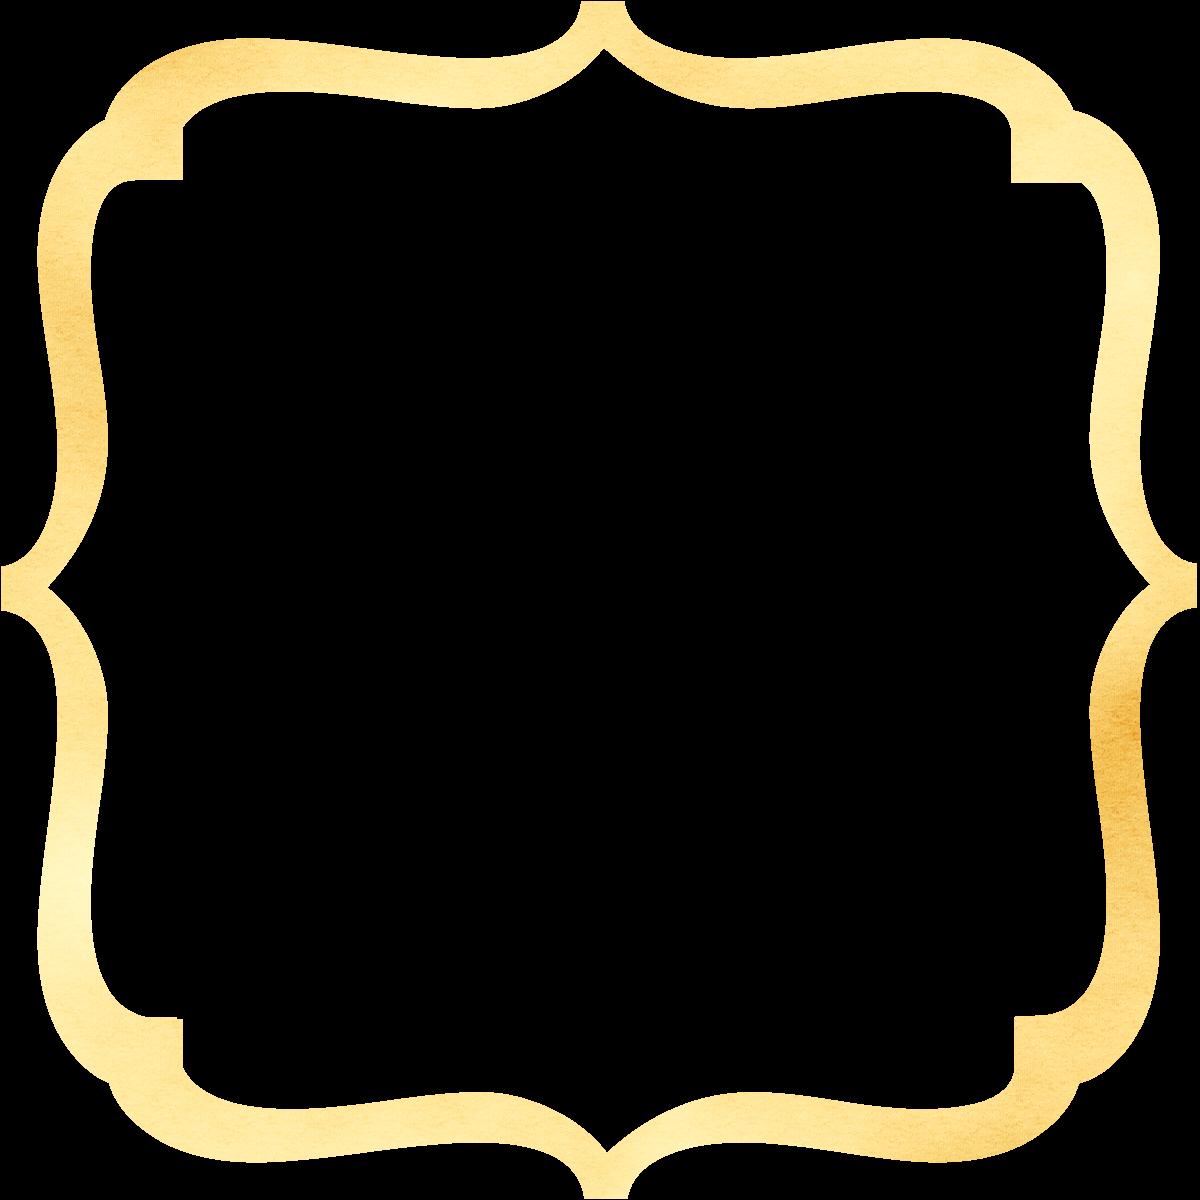 Humbug graphics galore bracket. Clipart frames gold glitter